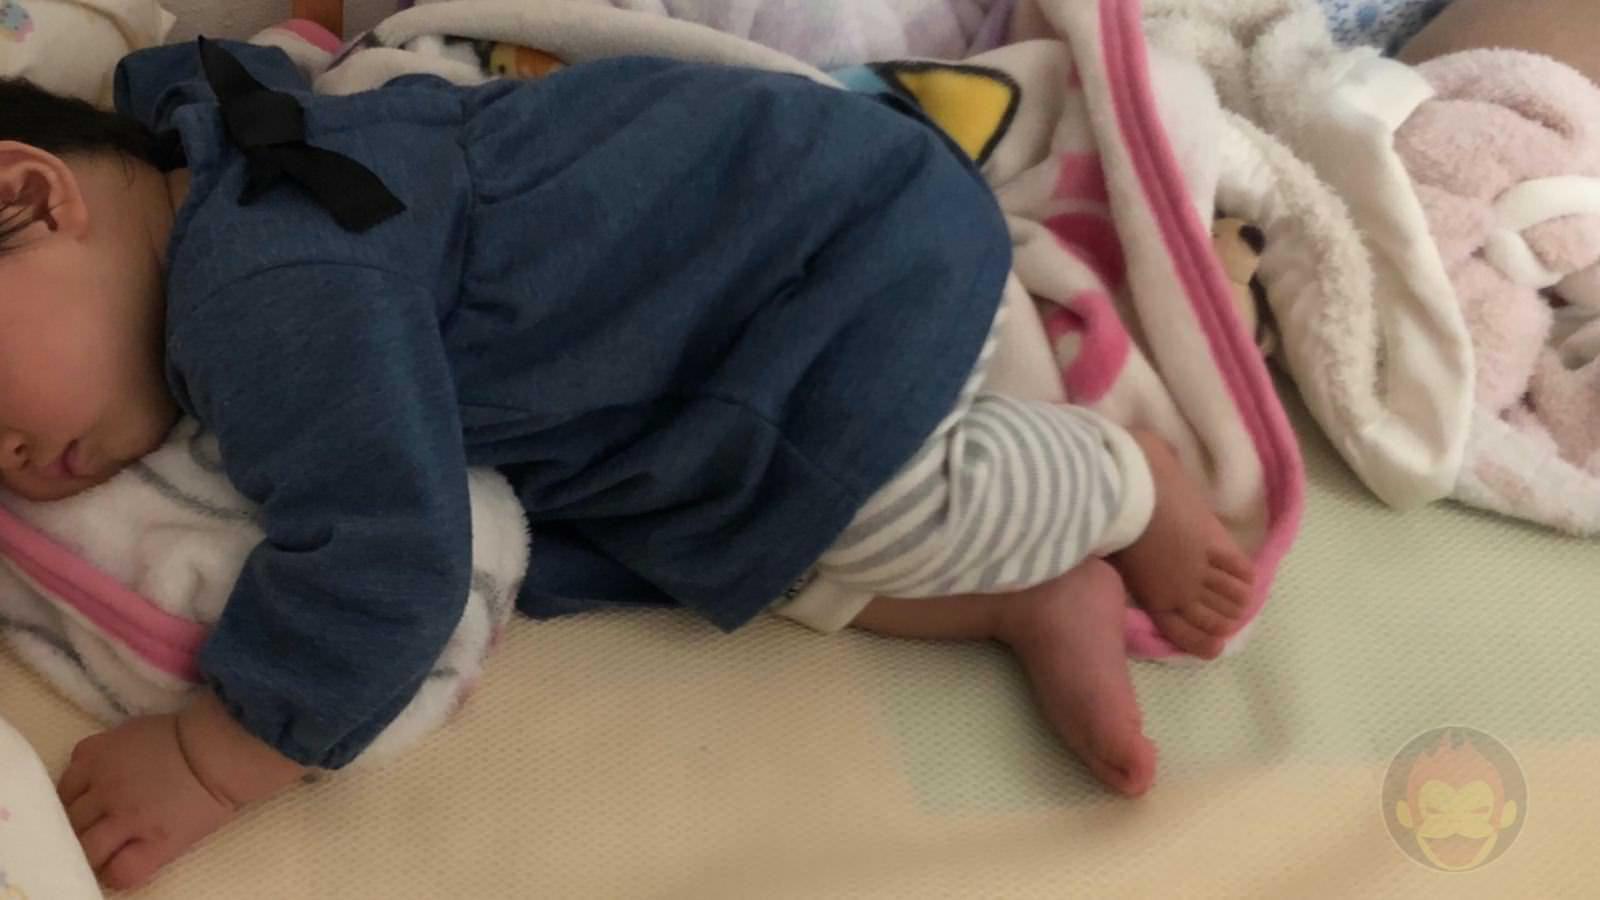 My-Little-Girl-Asleep-like-an-angel.jpg